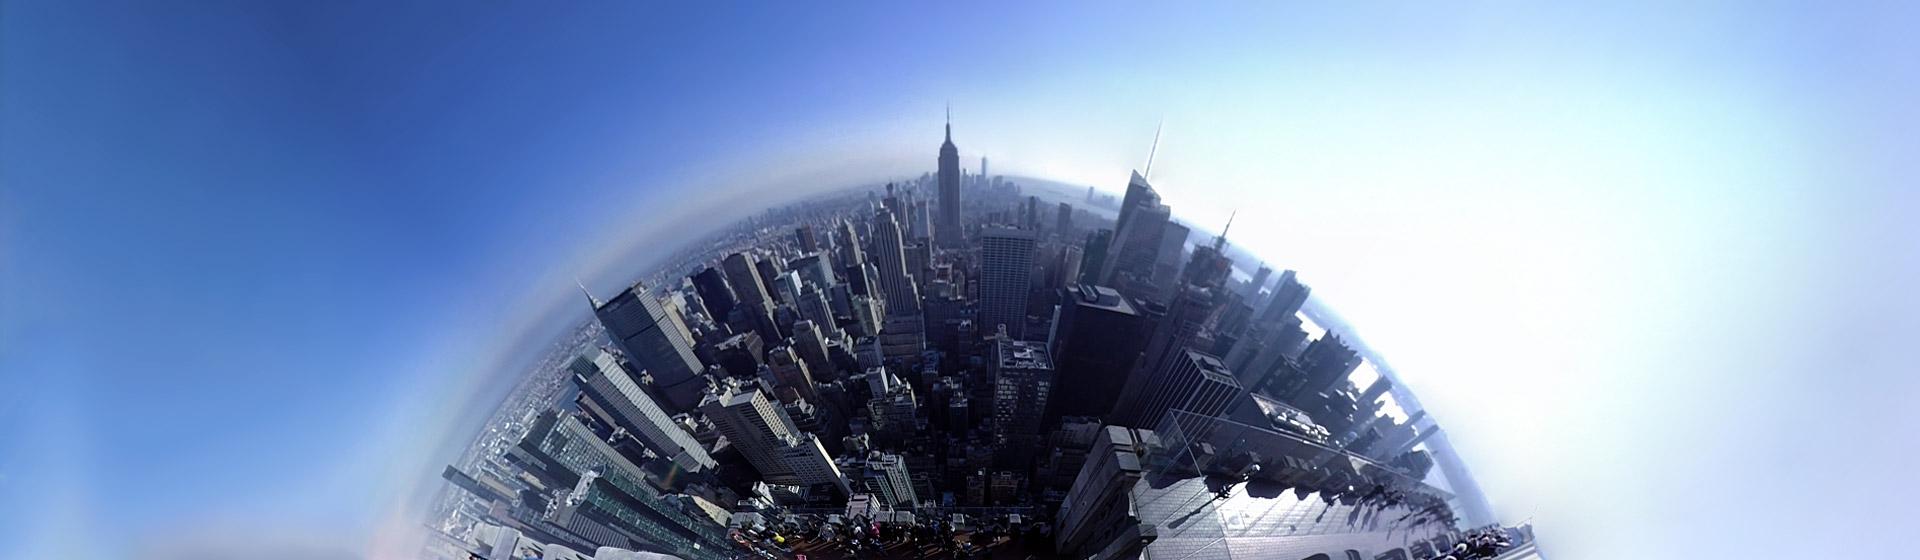 360° New York City